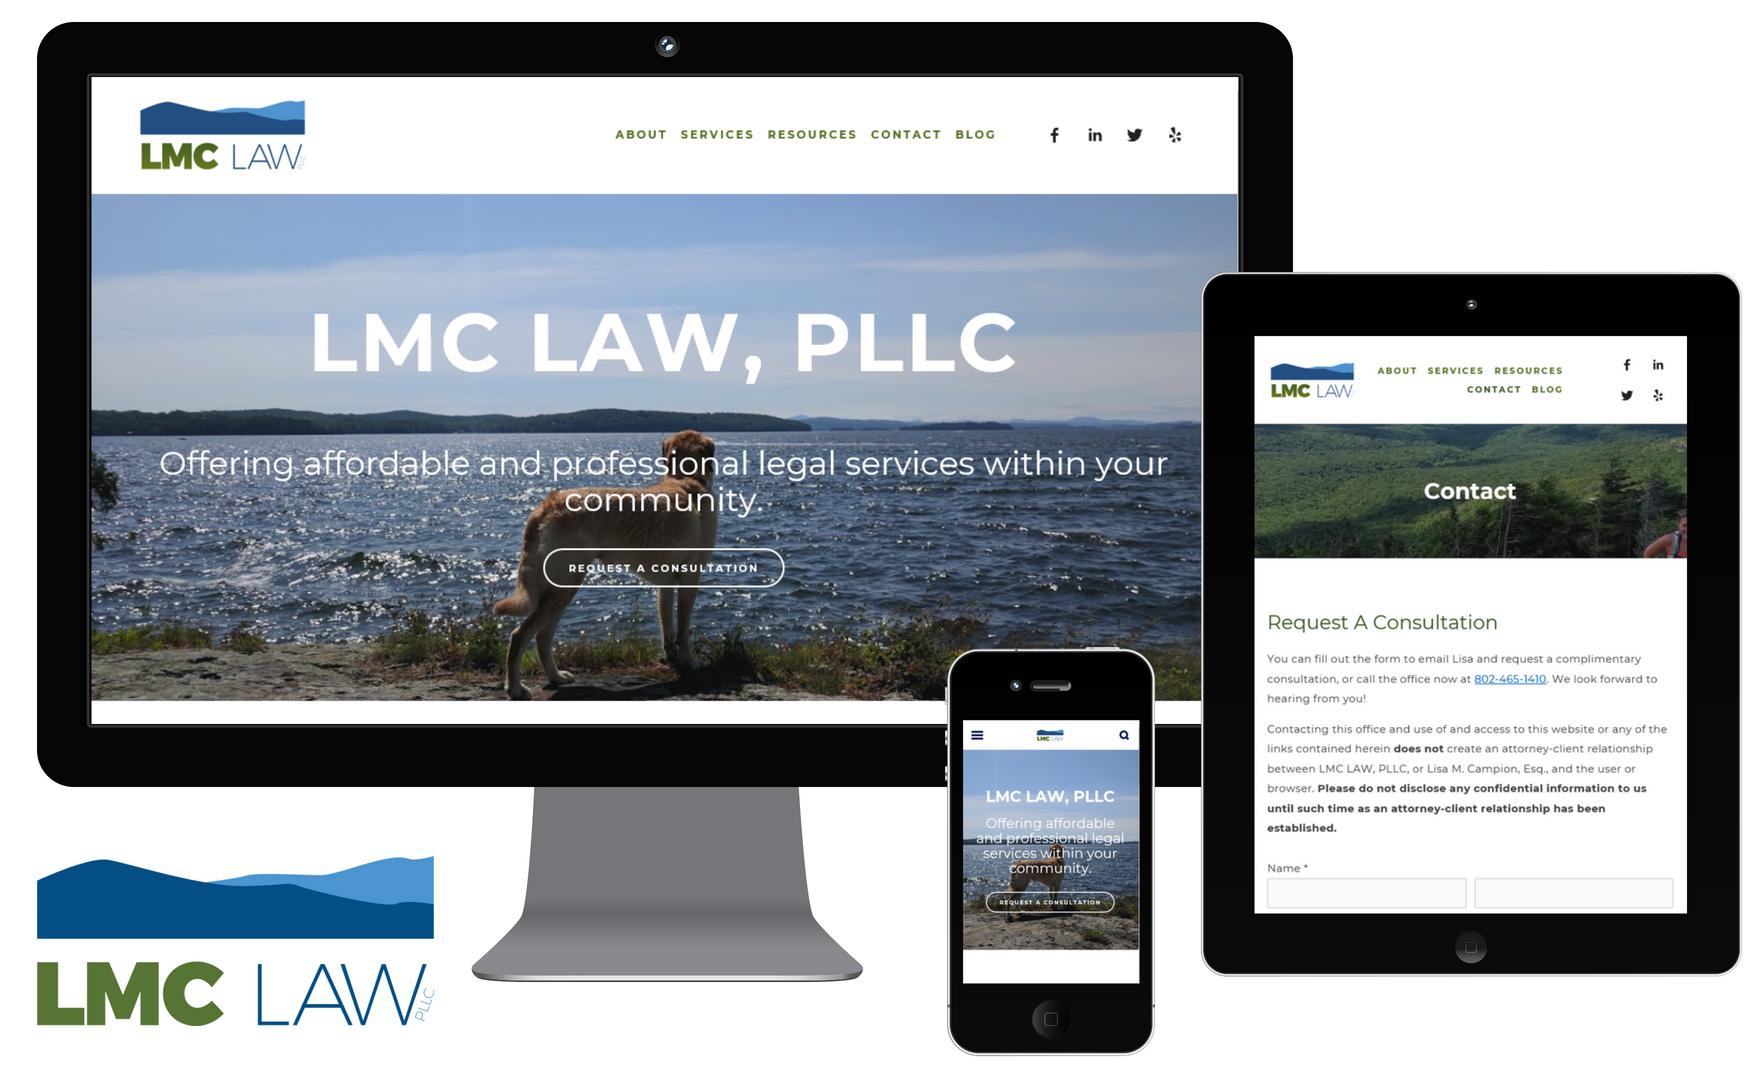 LMC Law, PLLC Website